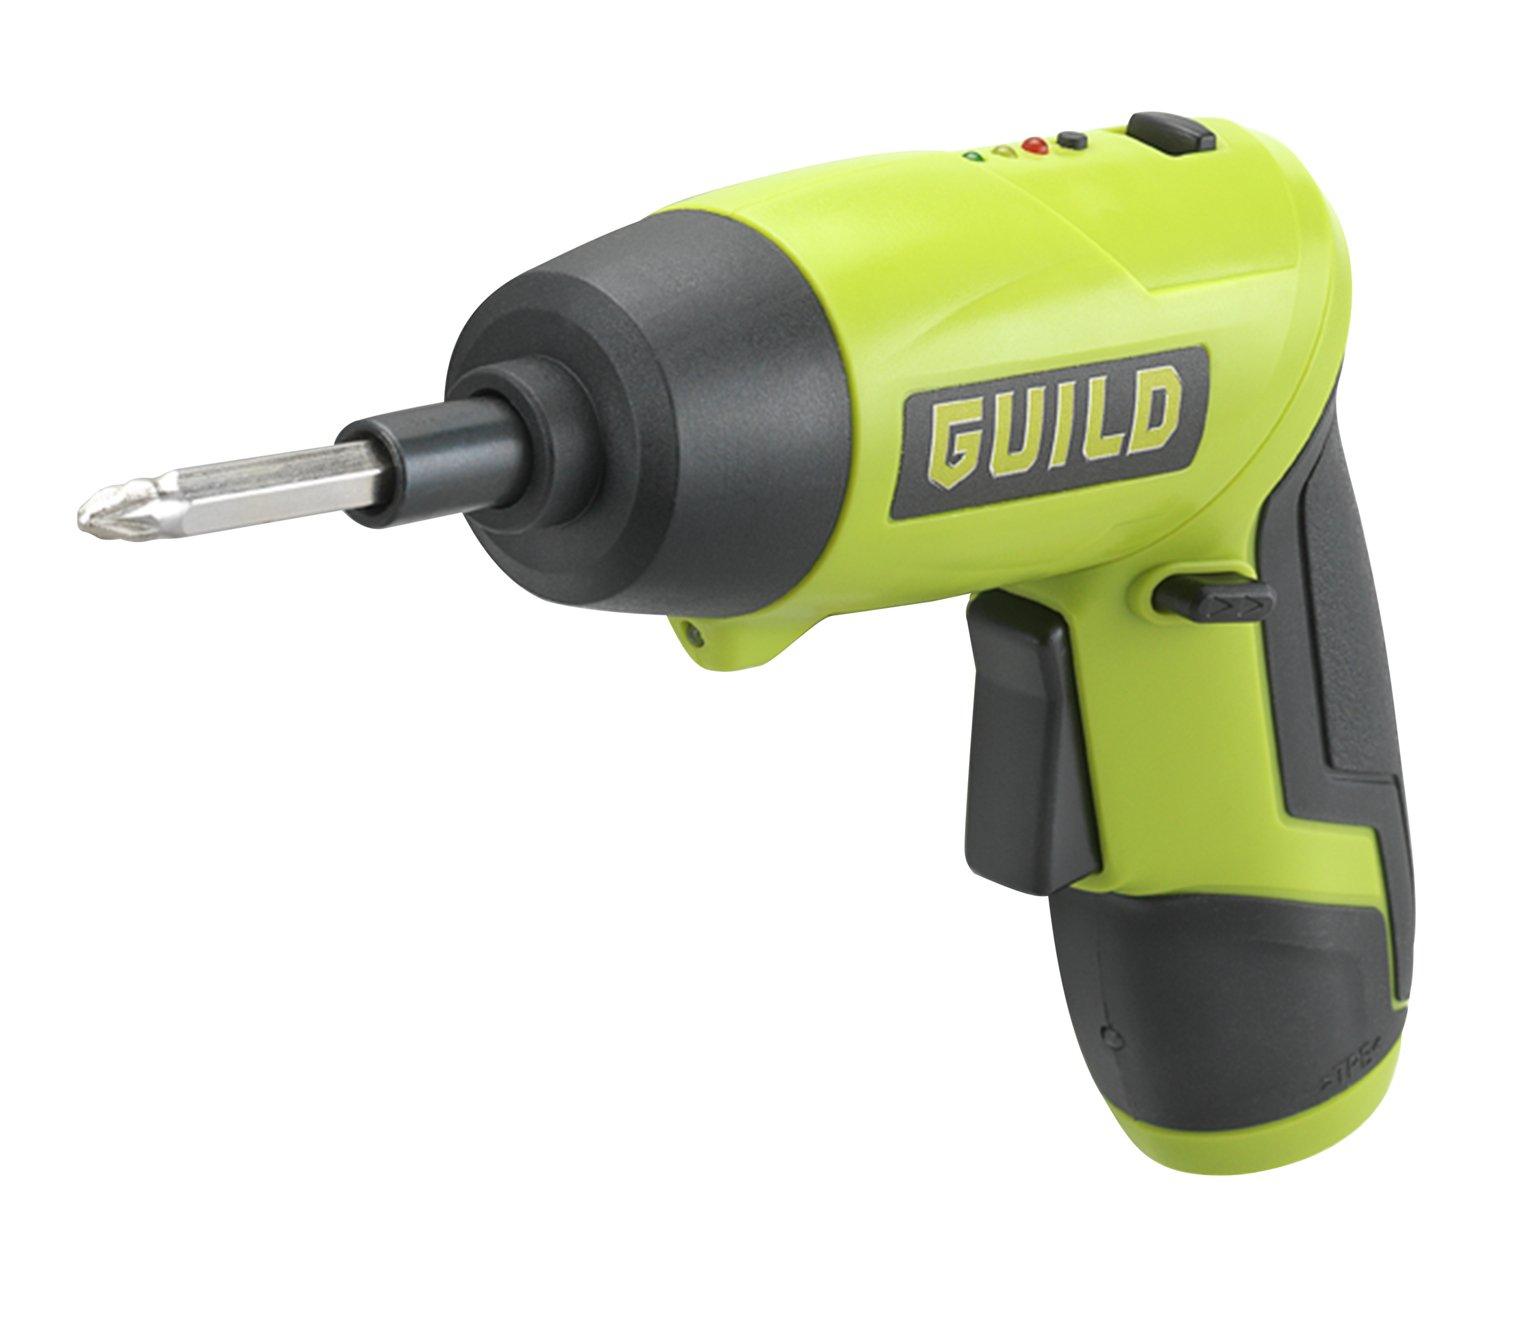 screwdrivers argos rh argos co uk Philips User Guides Speaker Bt7900 Philips Universal Remote User Manual